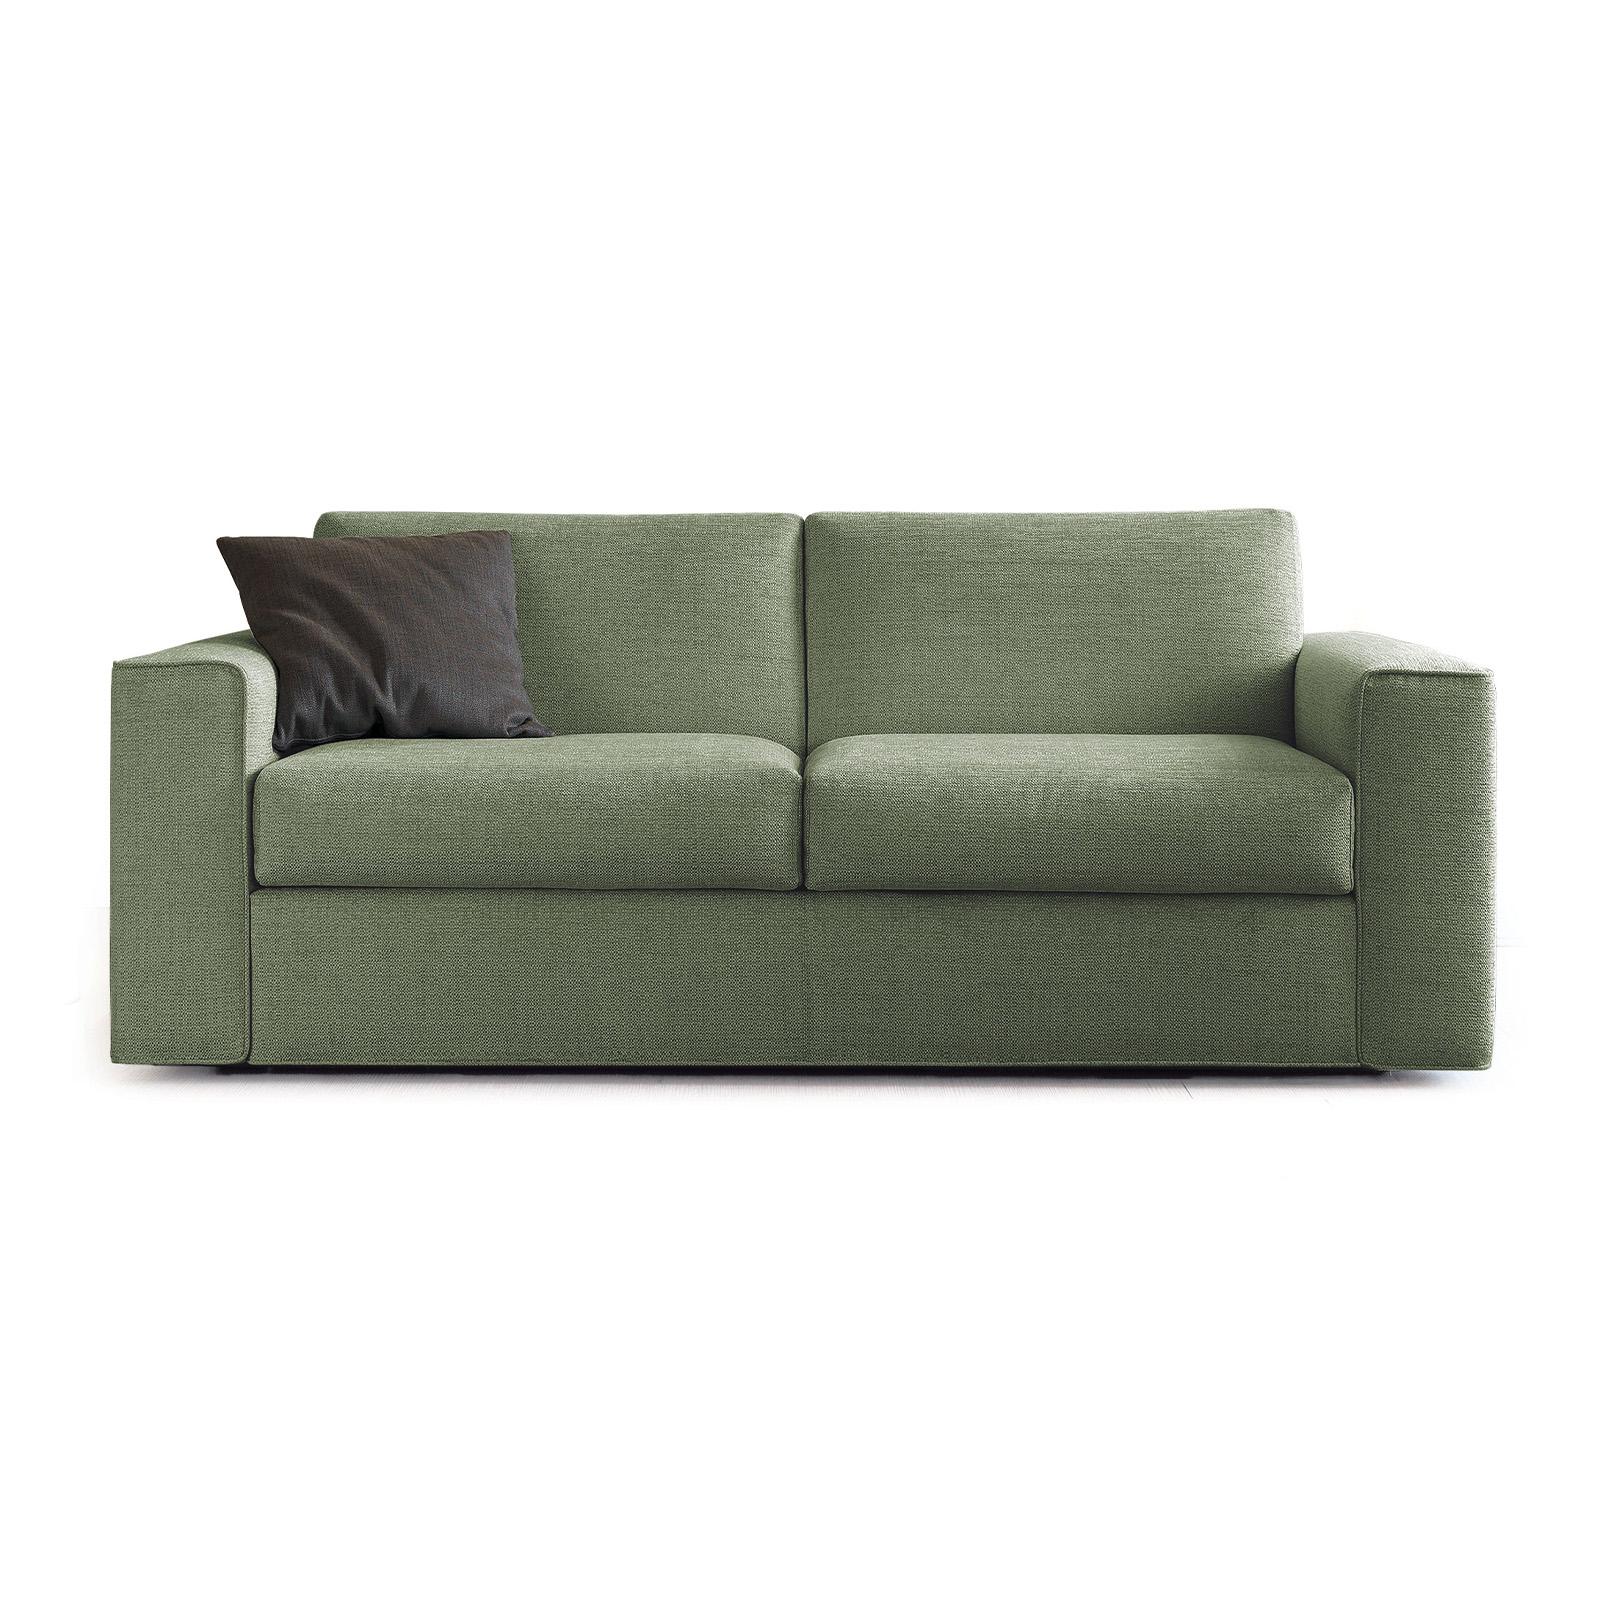 lario von pol74 cramer m bel design. Black Bedroom Furniture Sets. Home Design Ideas